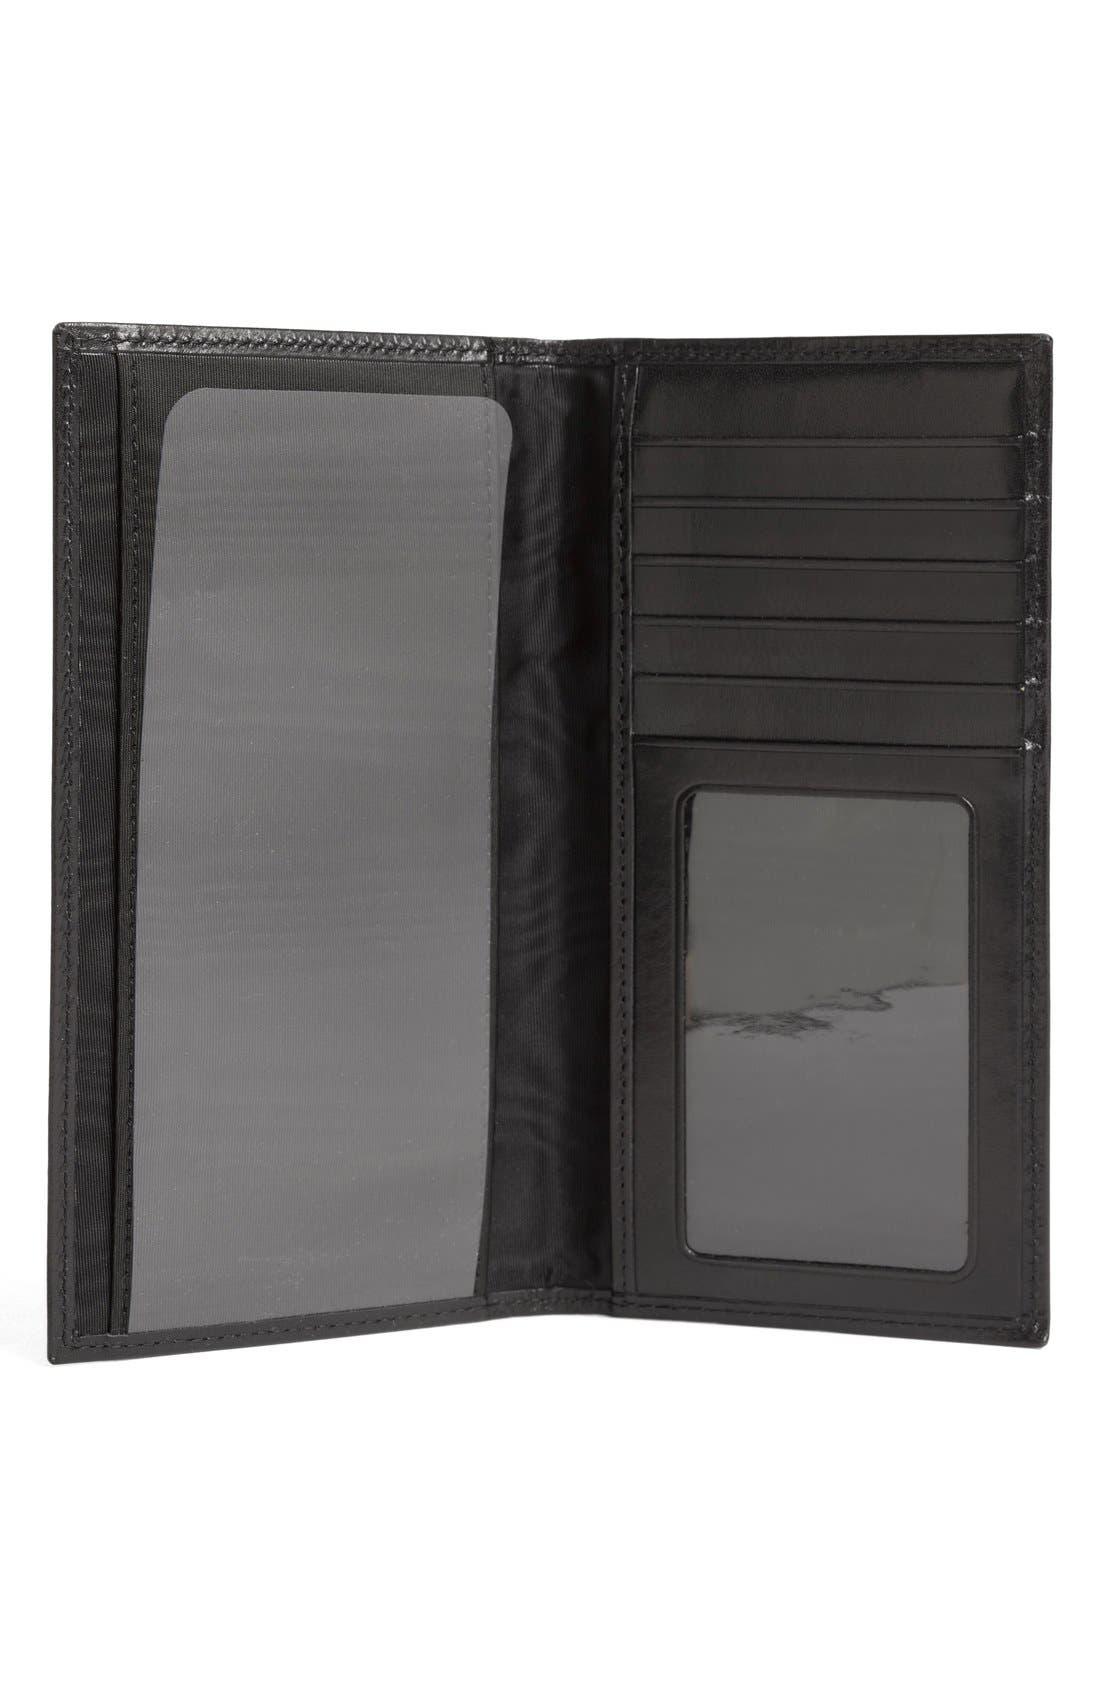 Alternate Image 2  - Bosca 'Old Leather' Checkbook Wallet